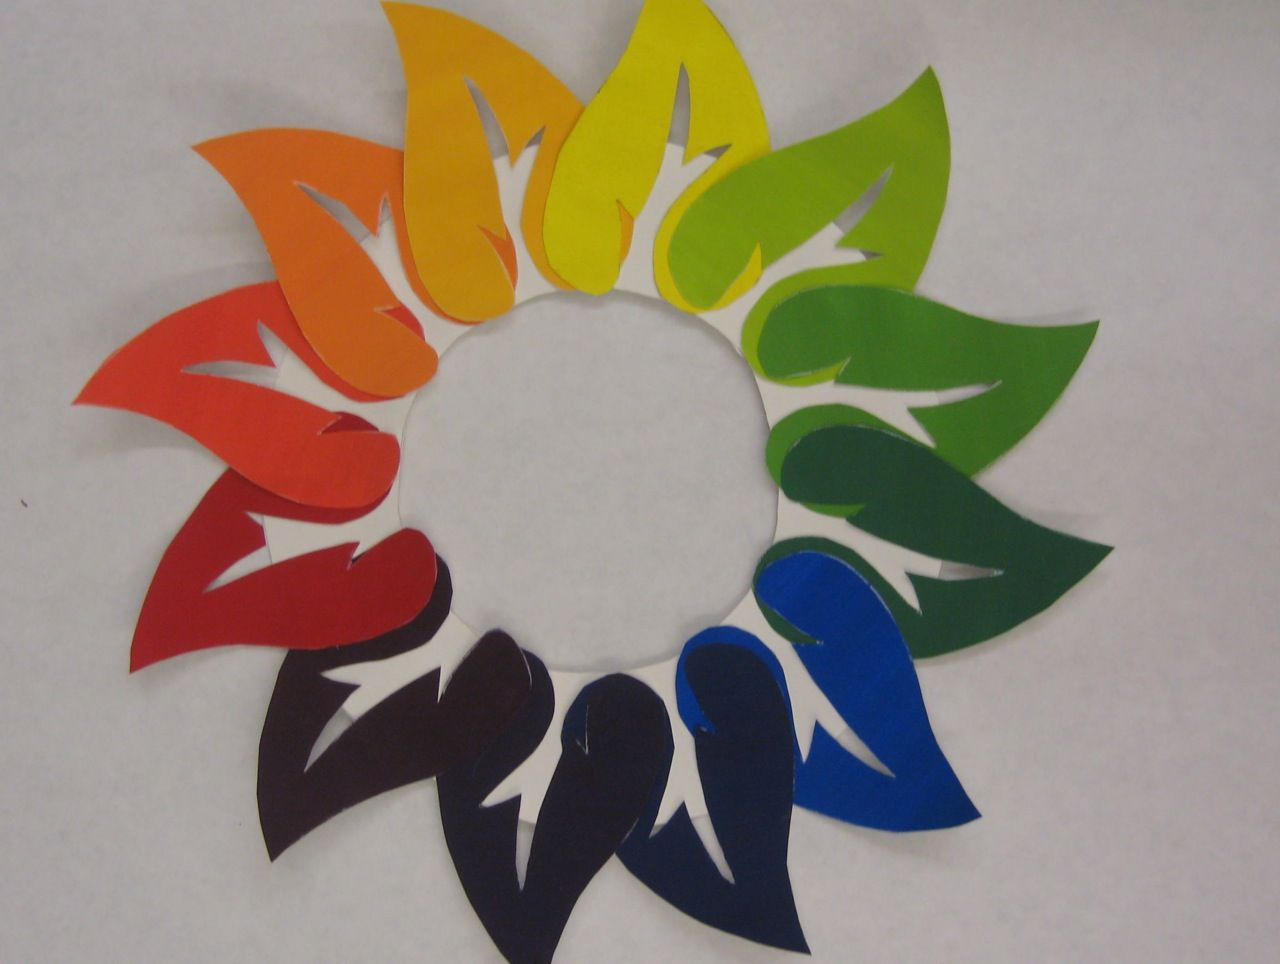 Pin By Samantha Uytioco On Color Wheel Designs Color Wheel Design